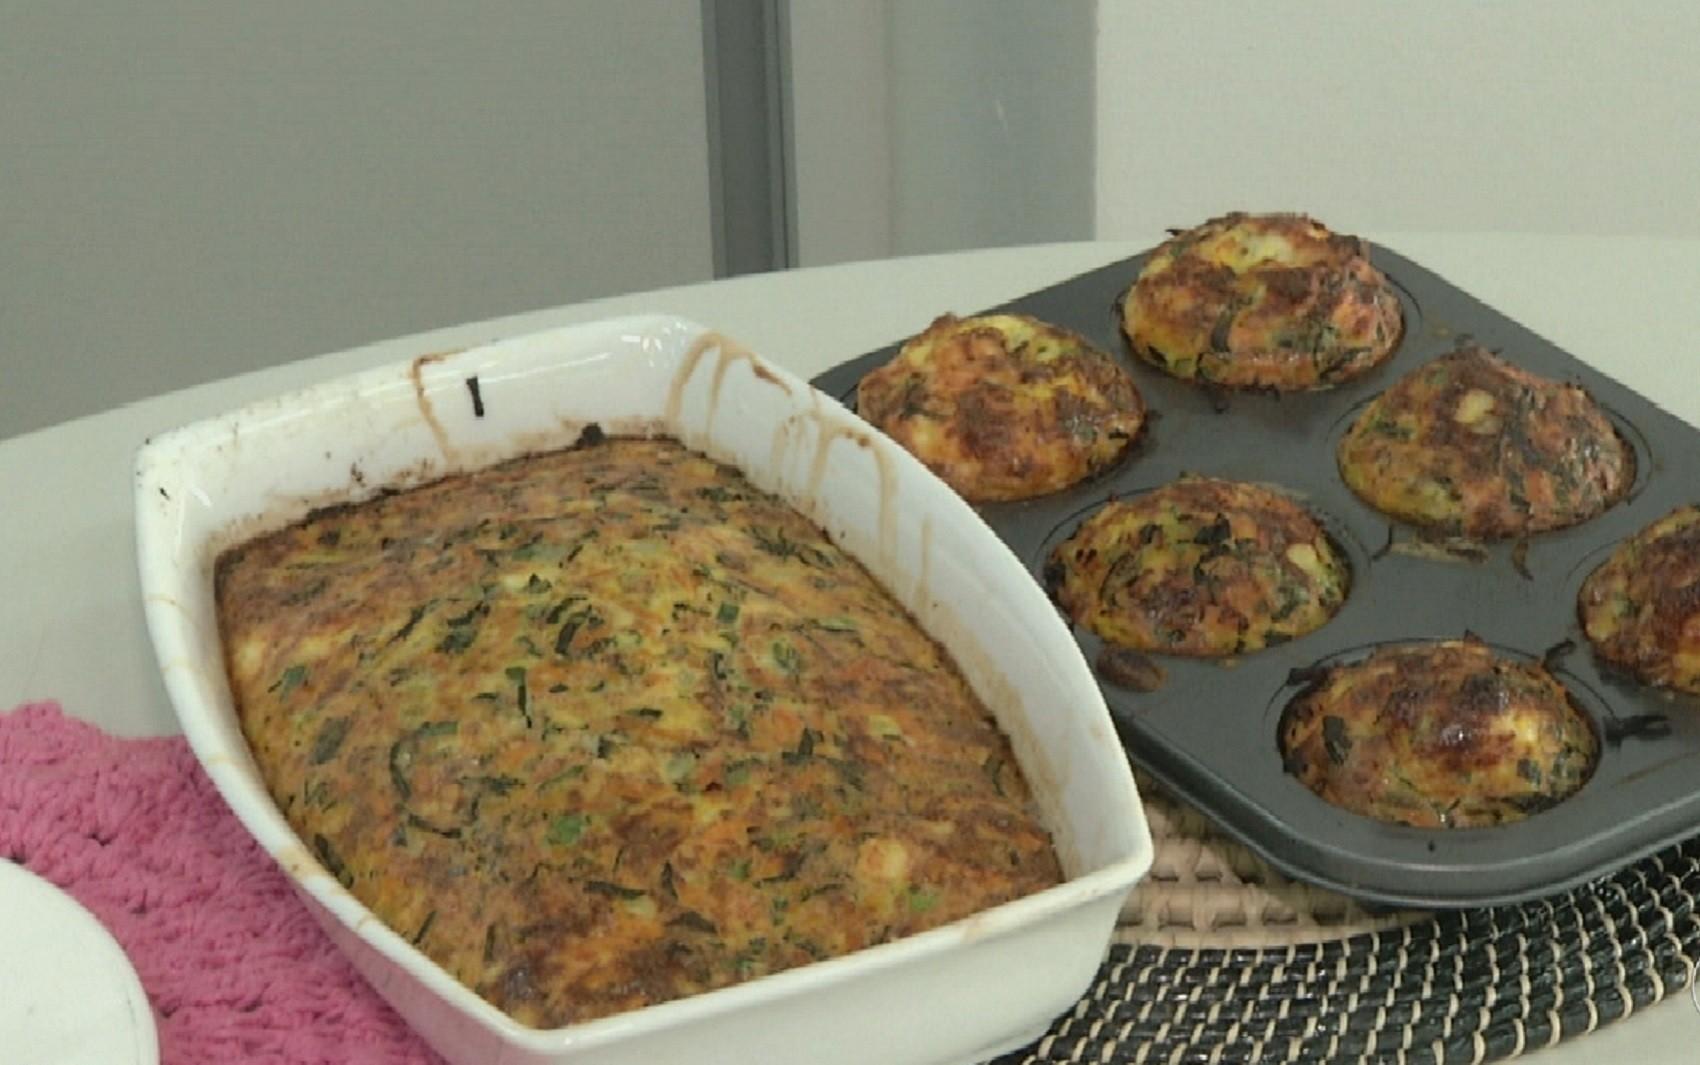 Aprenda a receita de omelete de ora-pro-nóbis